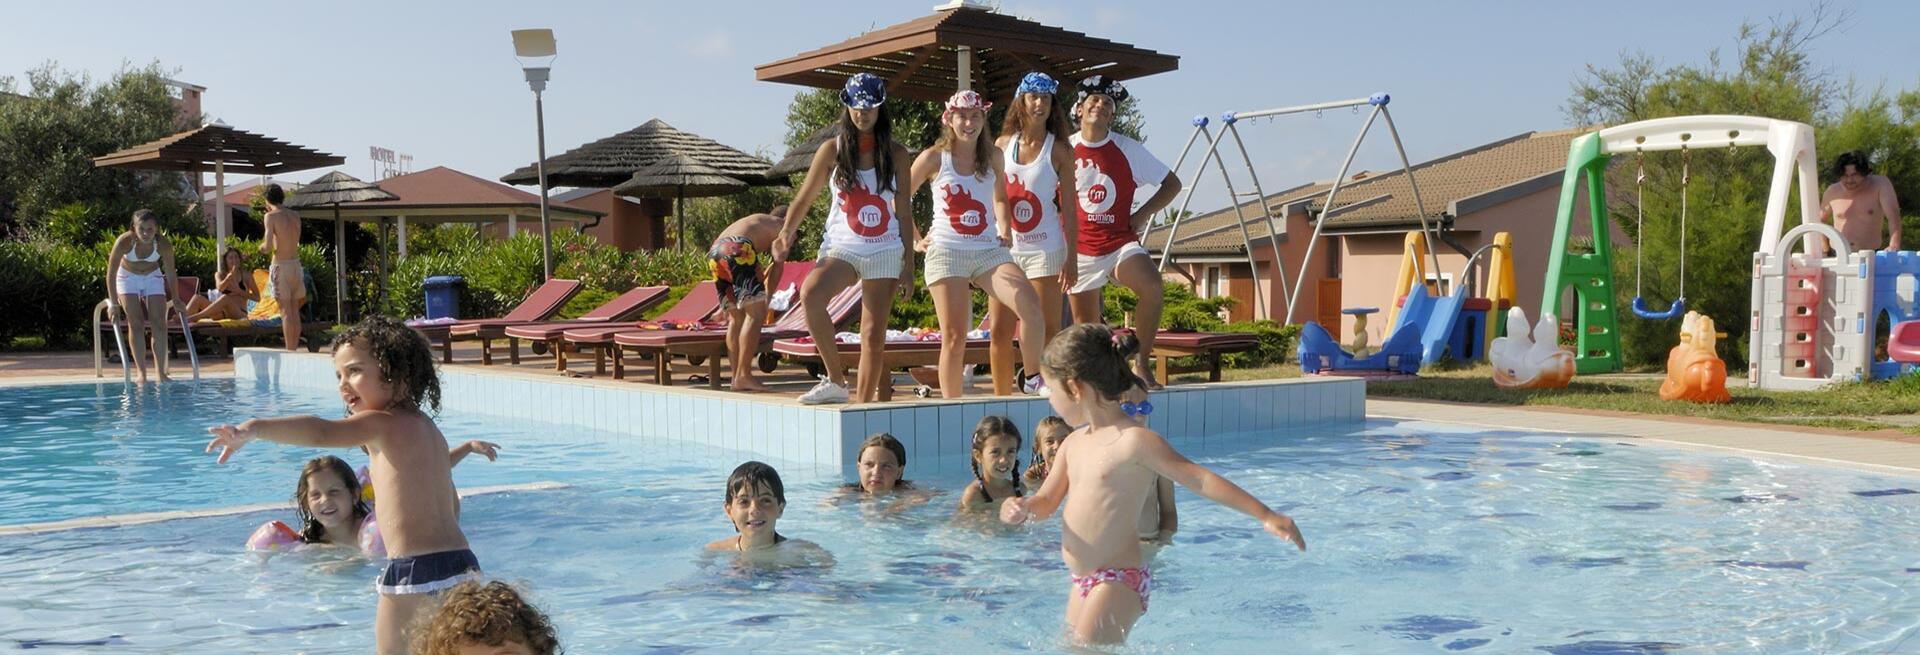 hotelcalarosa de serviceleistungen 015